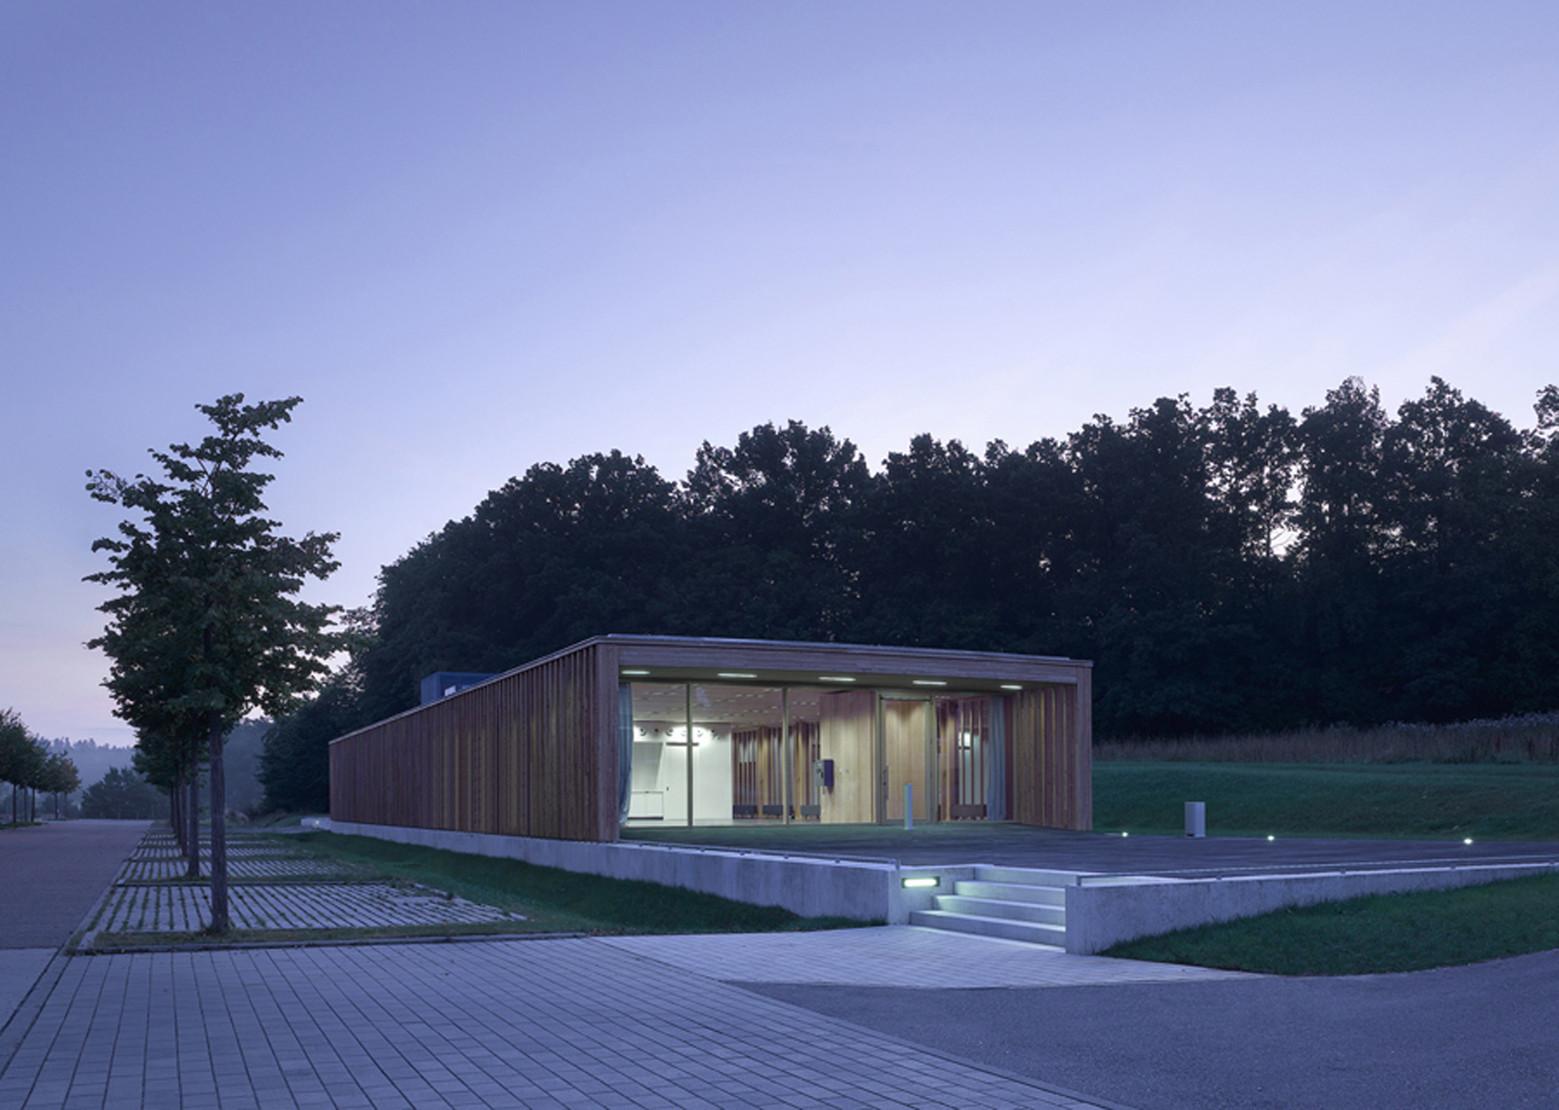 Gallery of cafeteria at the university aalen mgf architekten 6 - Mgf architekten ...